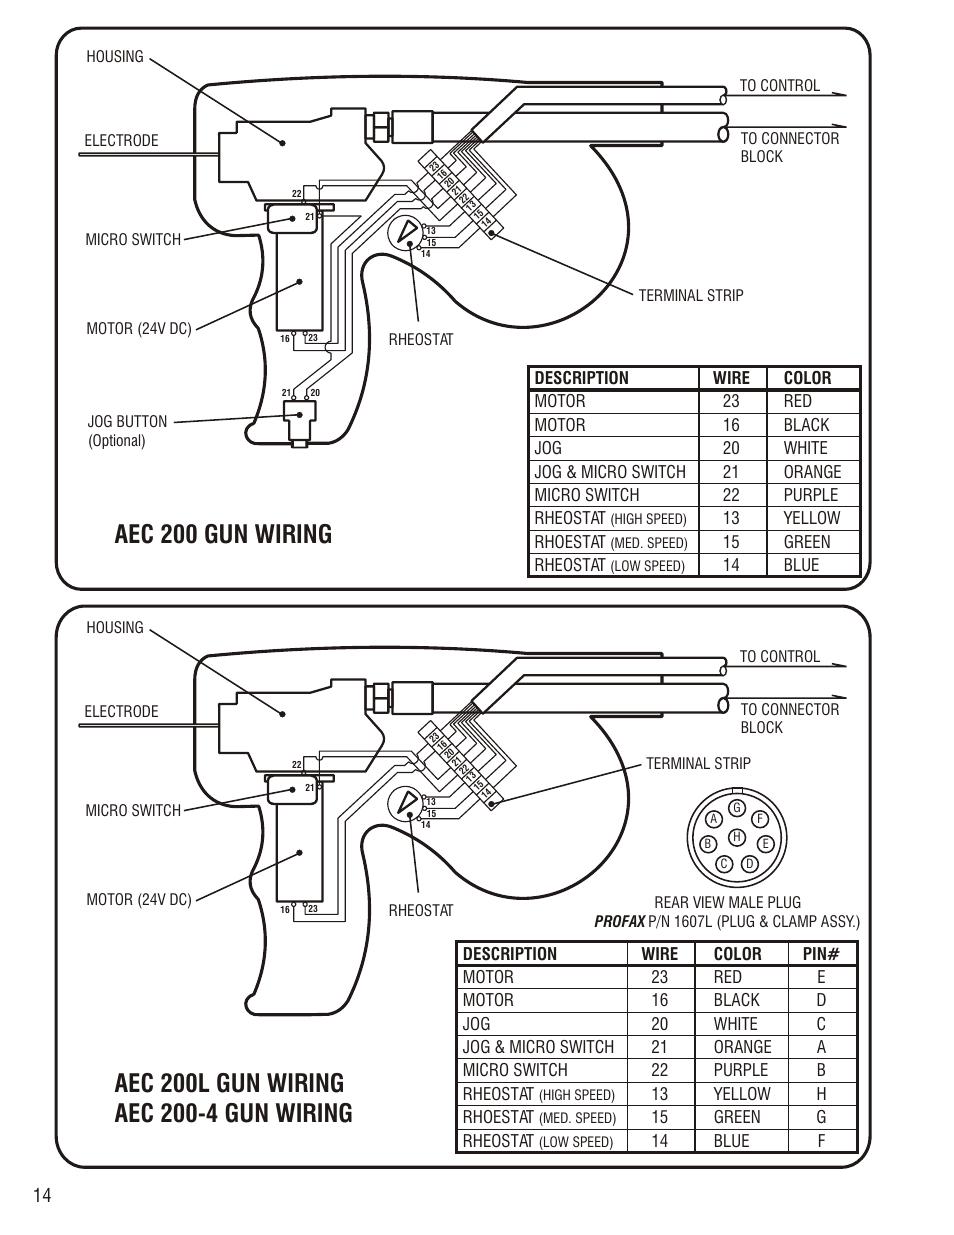 Aec 200p Gun Wiring Profax 200 User Manual Page 16 28 Micro Switch Diagram